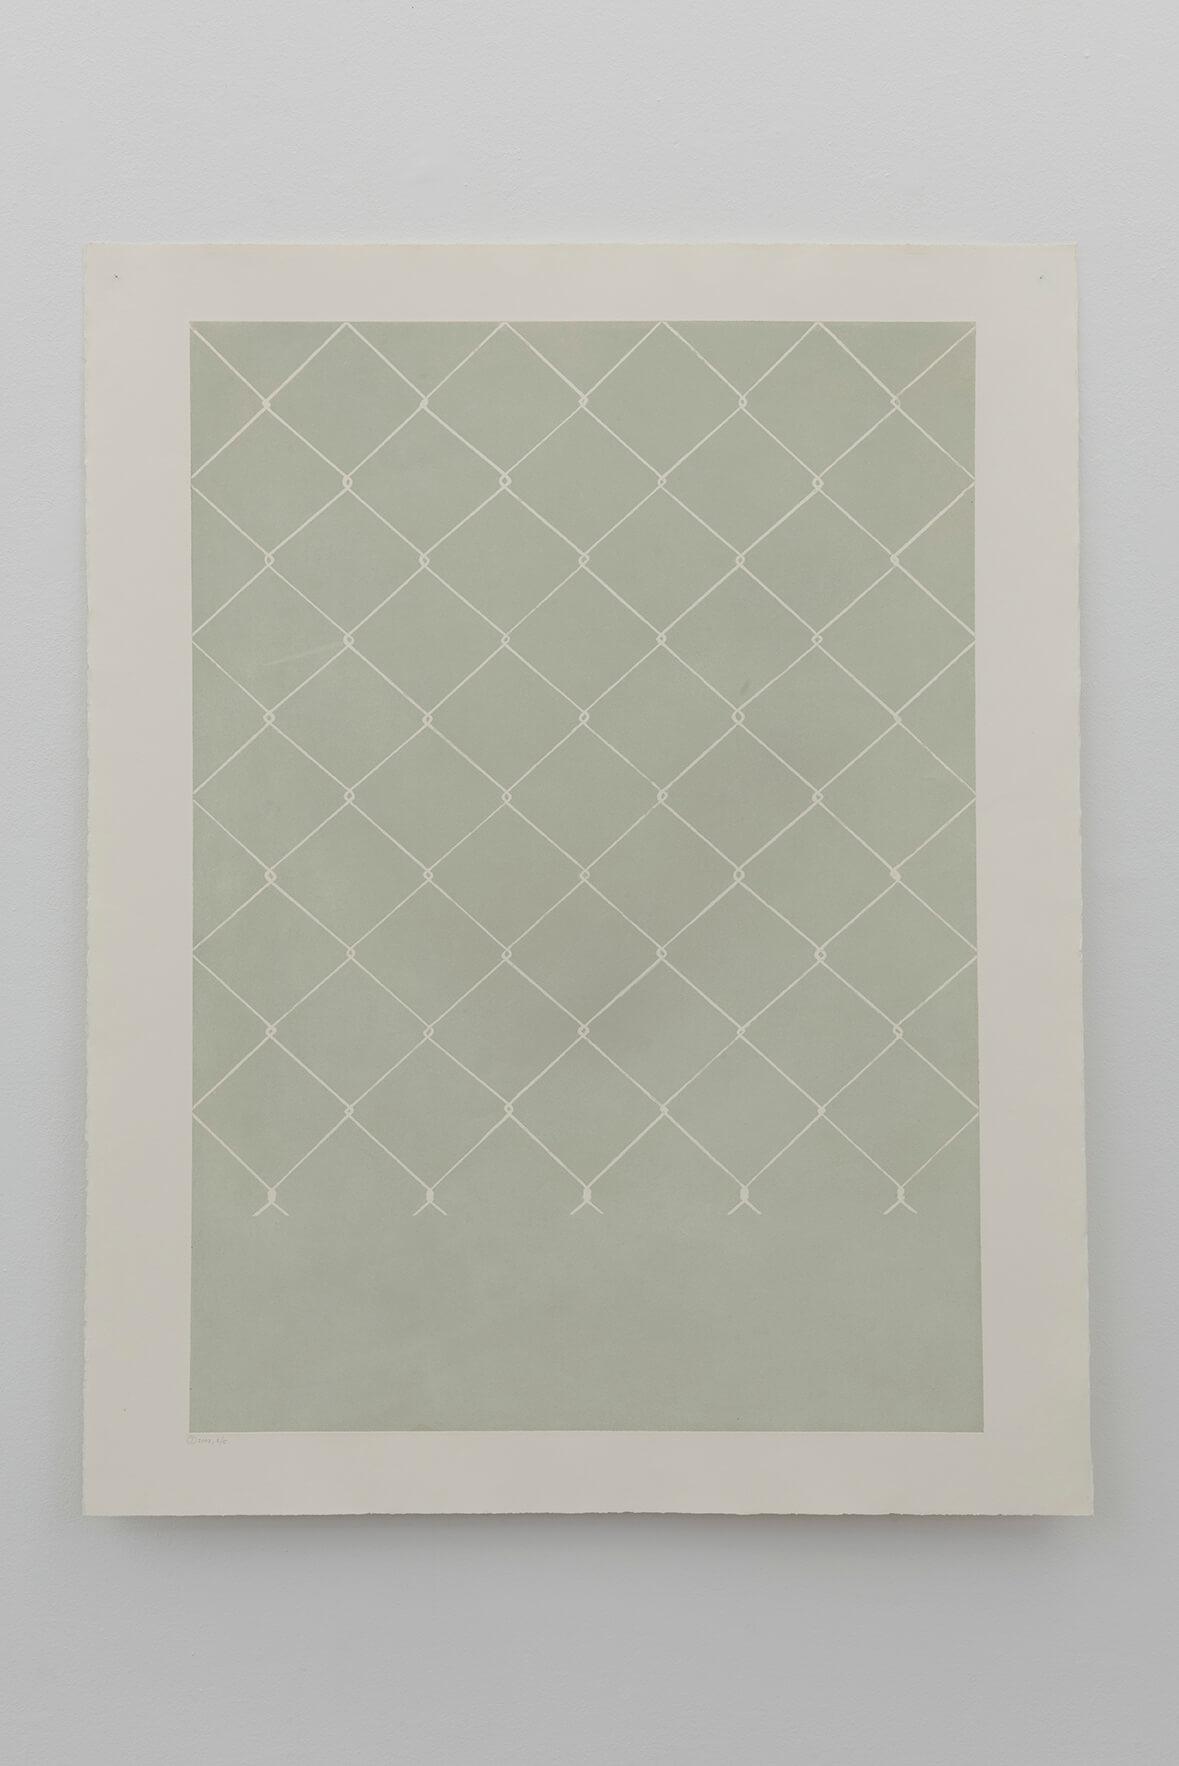 Untitled, 2002 | Abans que me n'oblidi | ProjecteSD